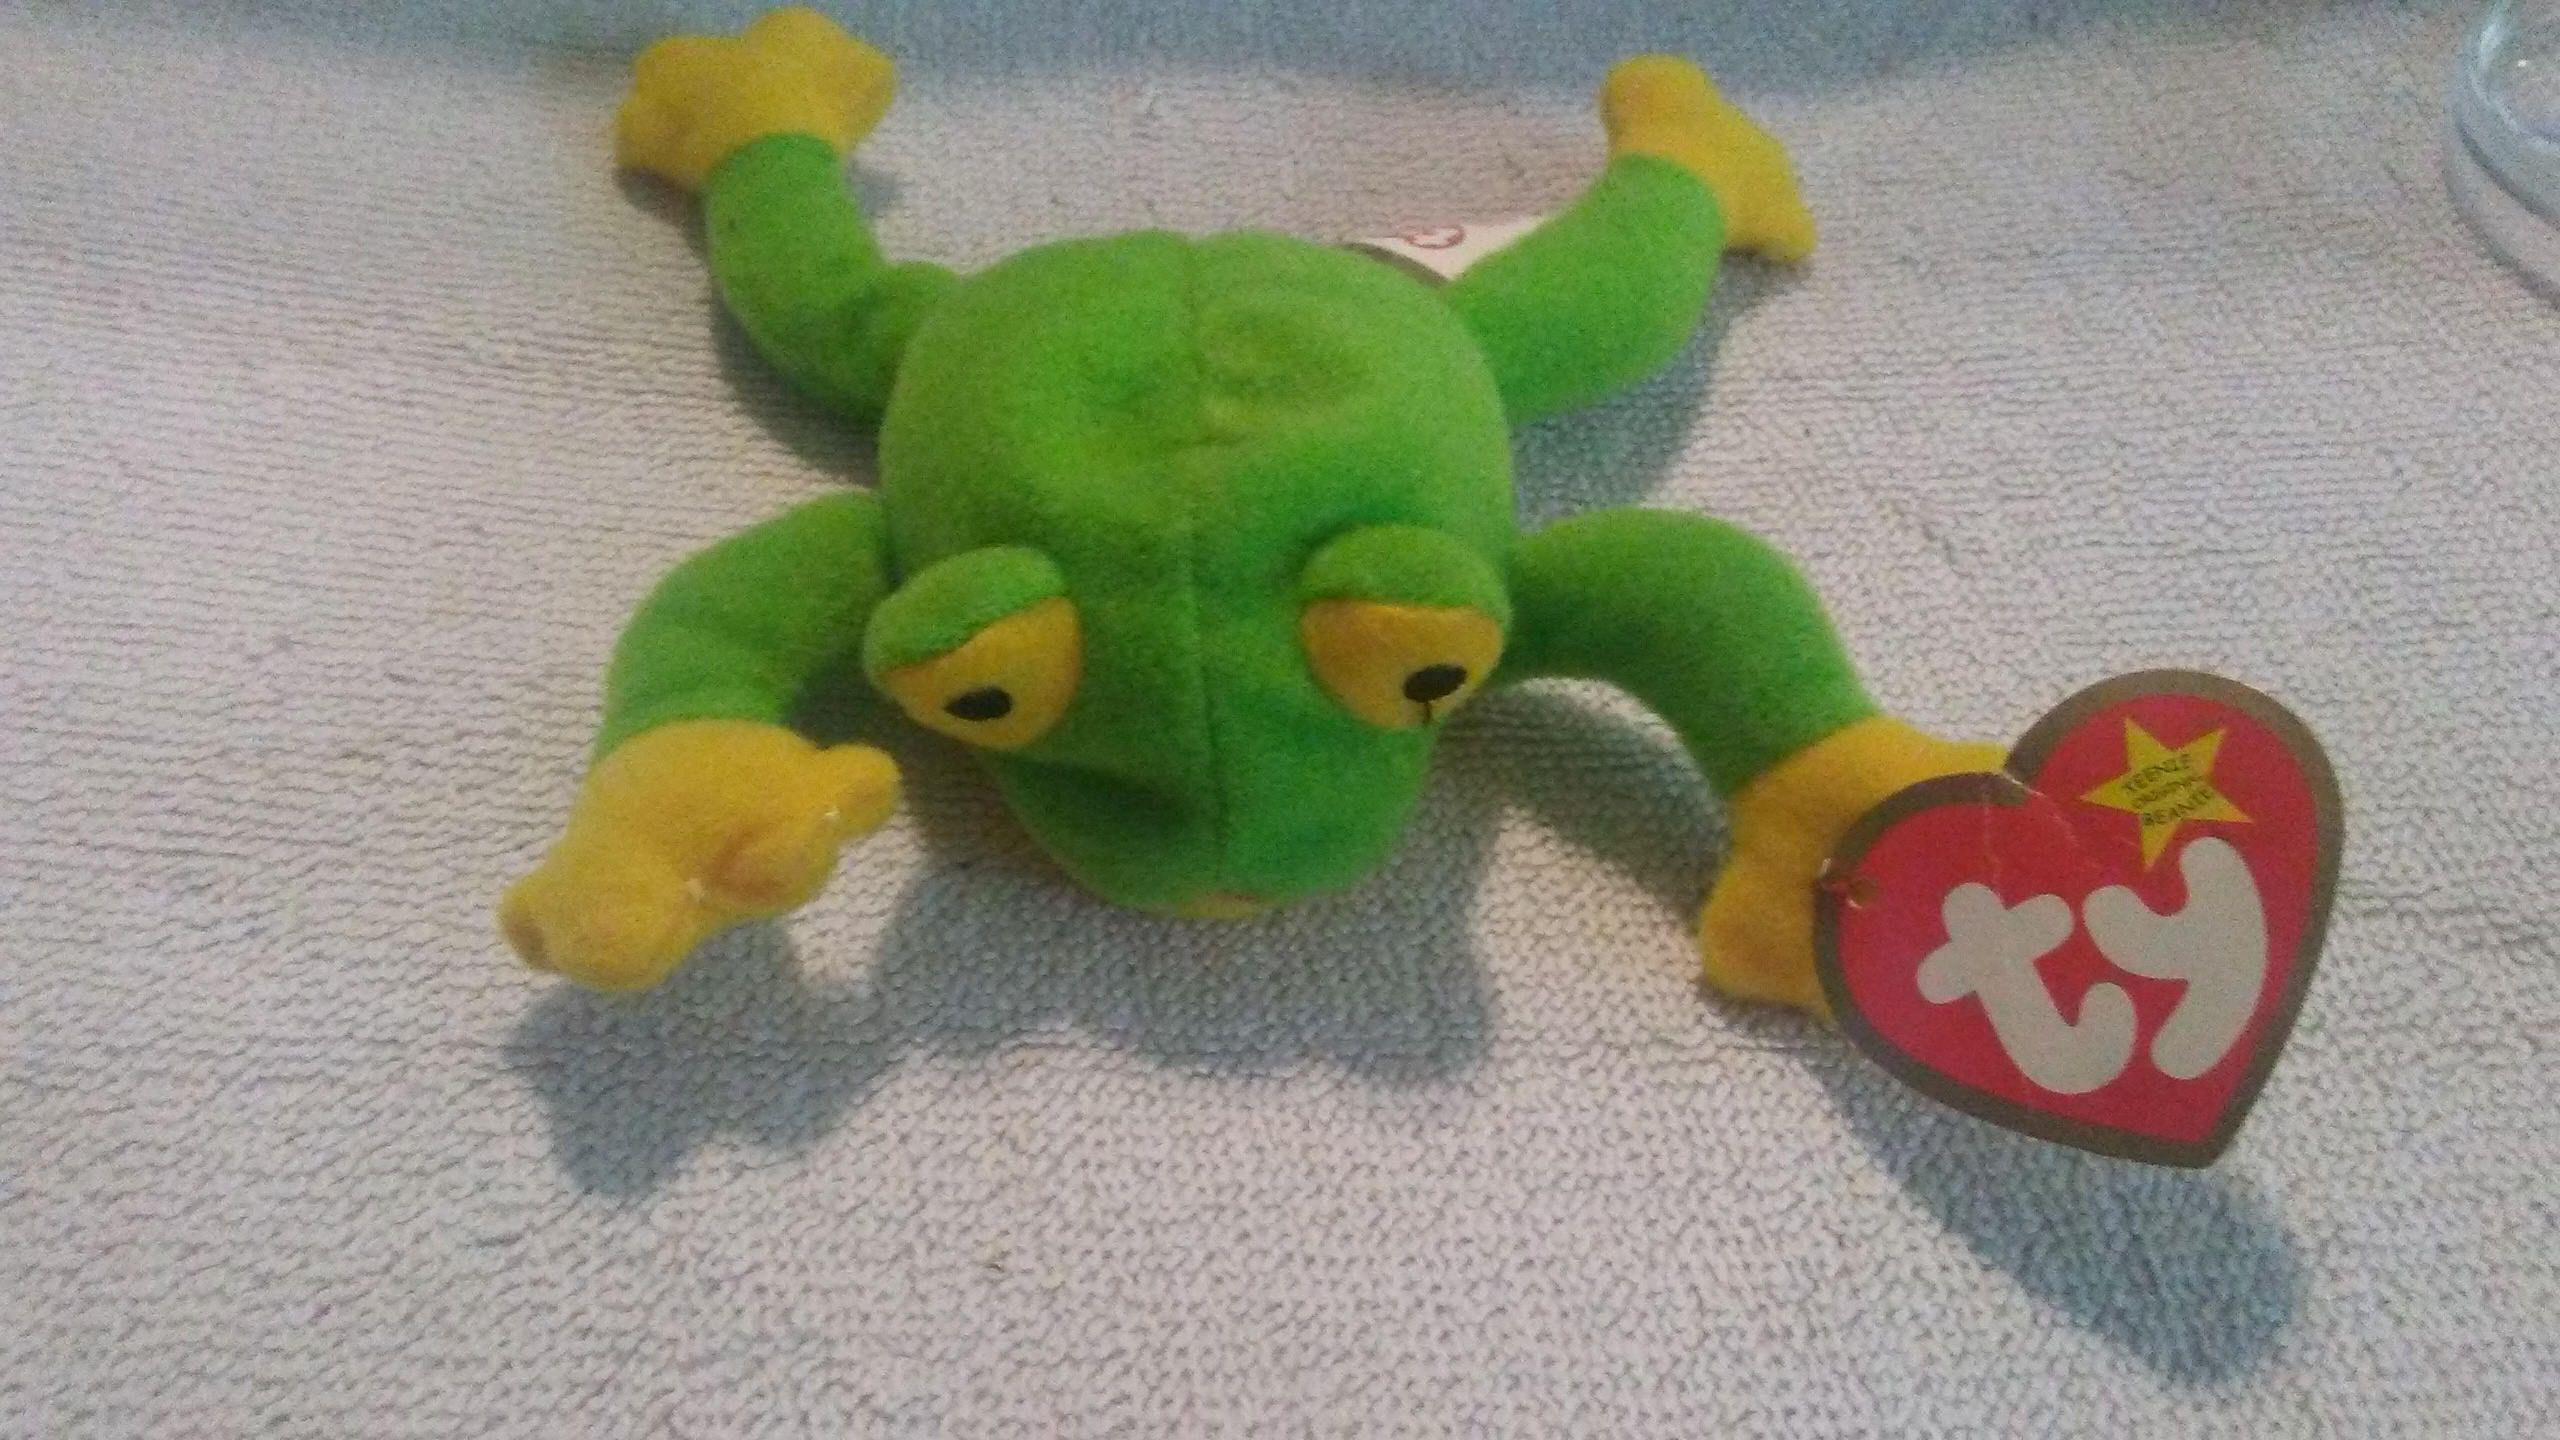 f5017f96a7d Teenie Beanie Baby  Smoochy The Frog by DandCVinylCutting on Etsy ...